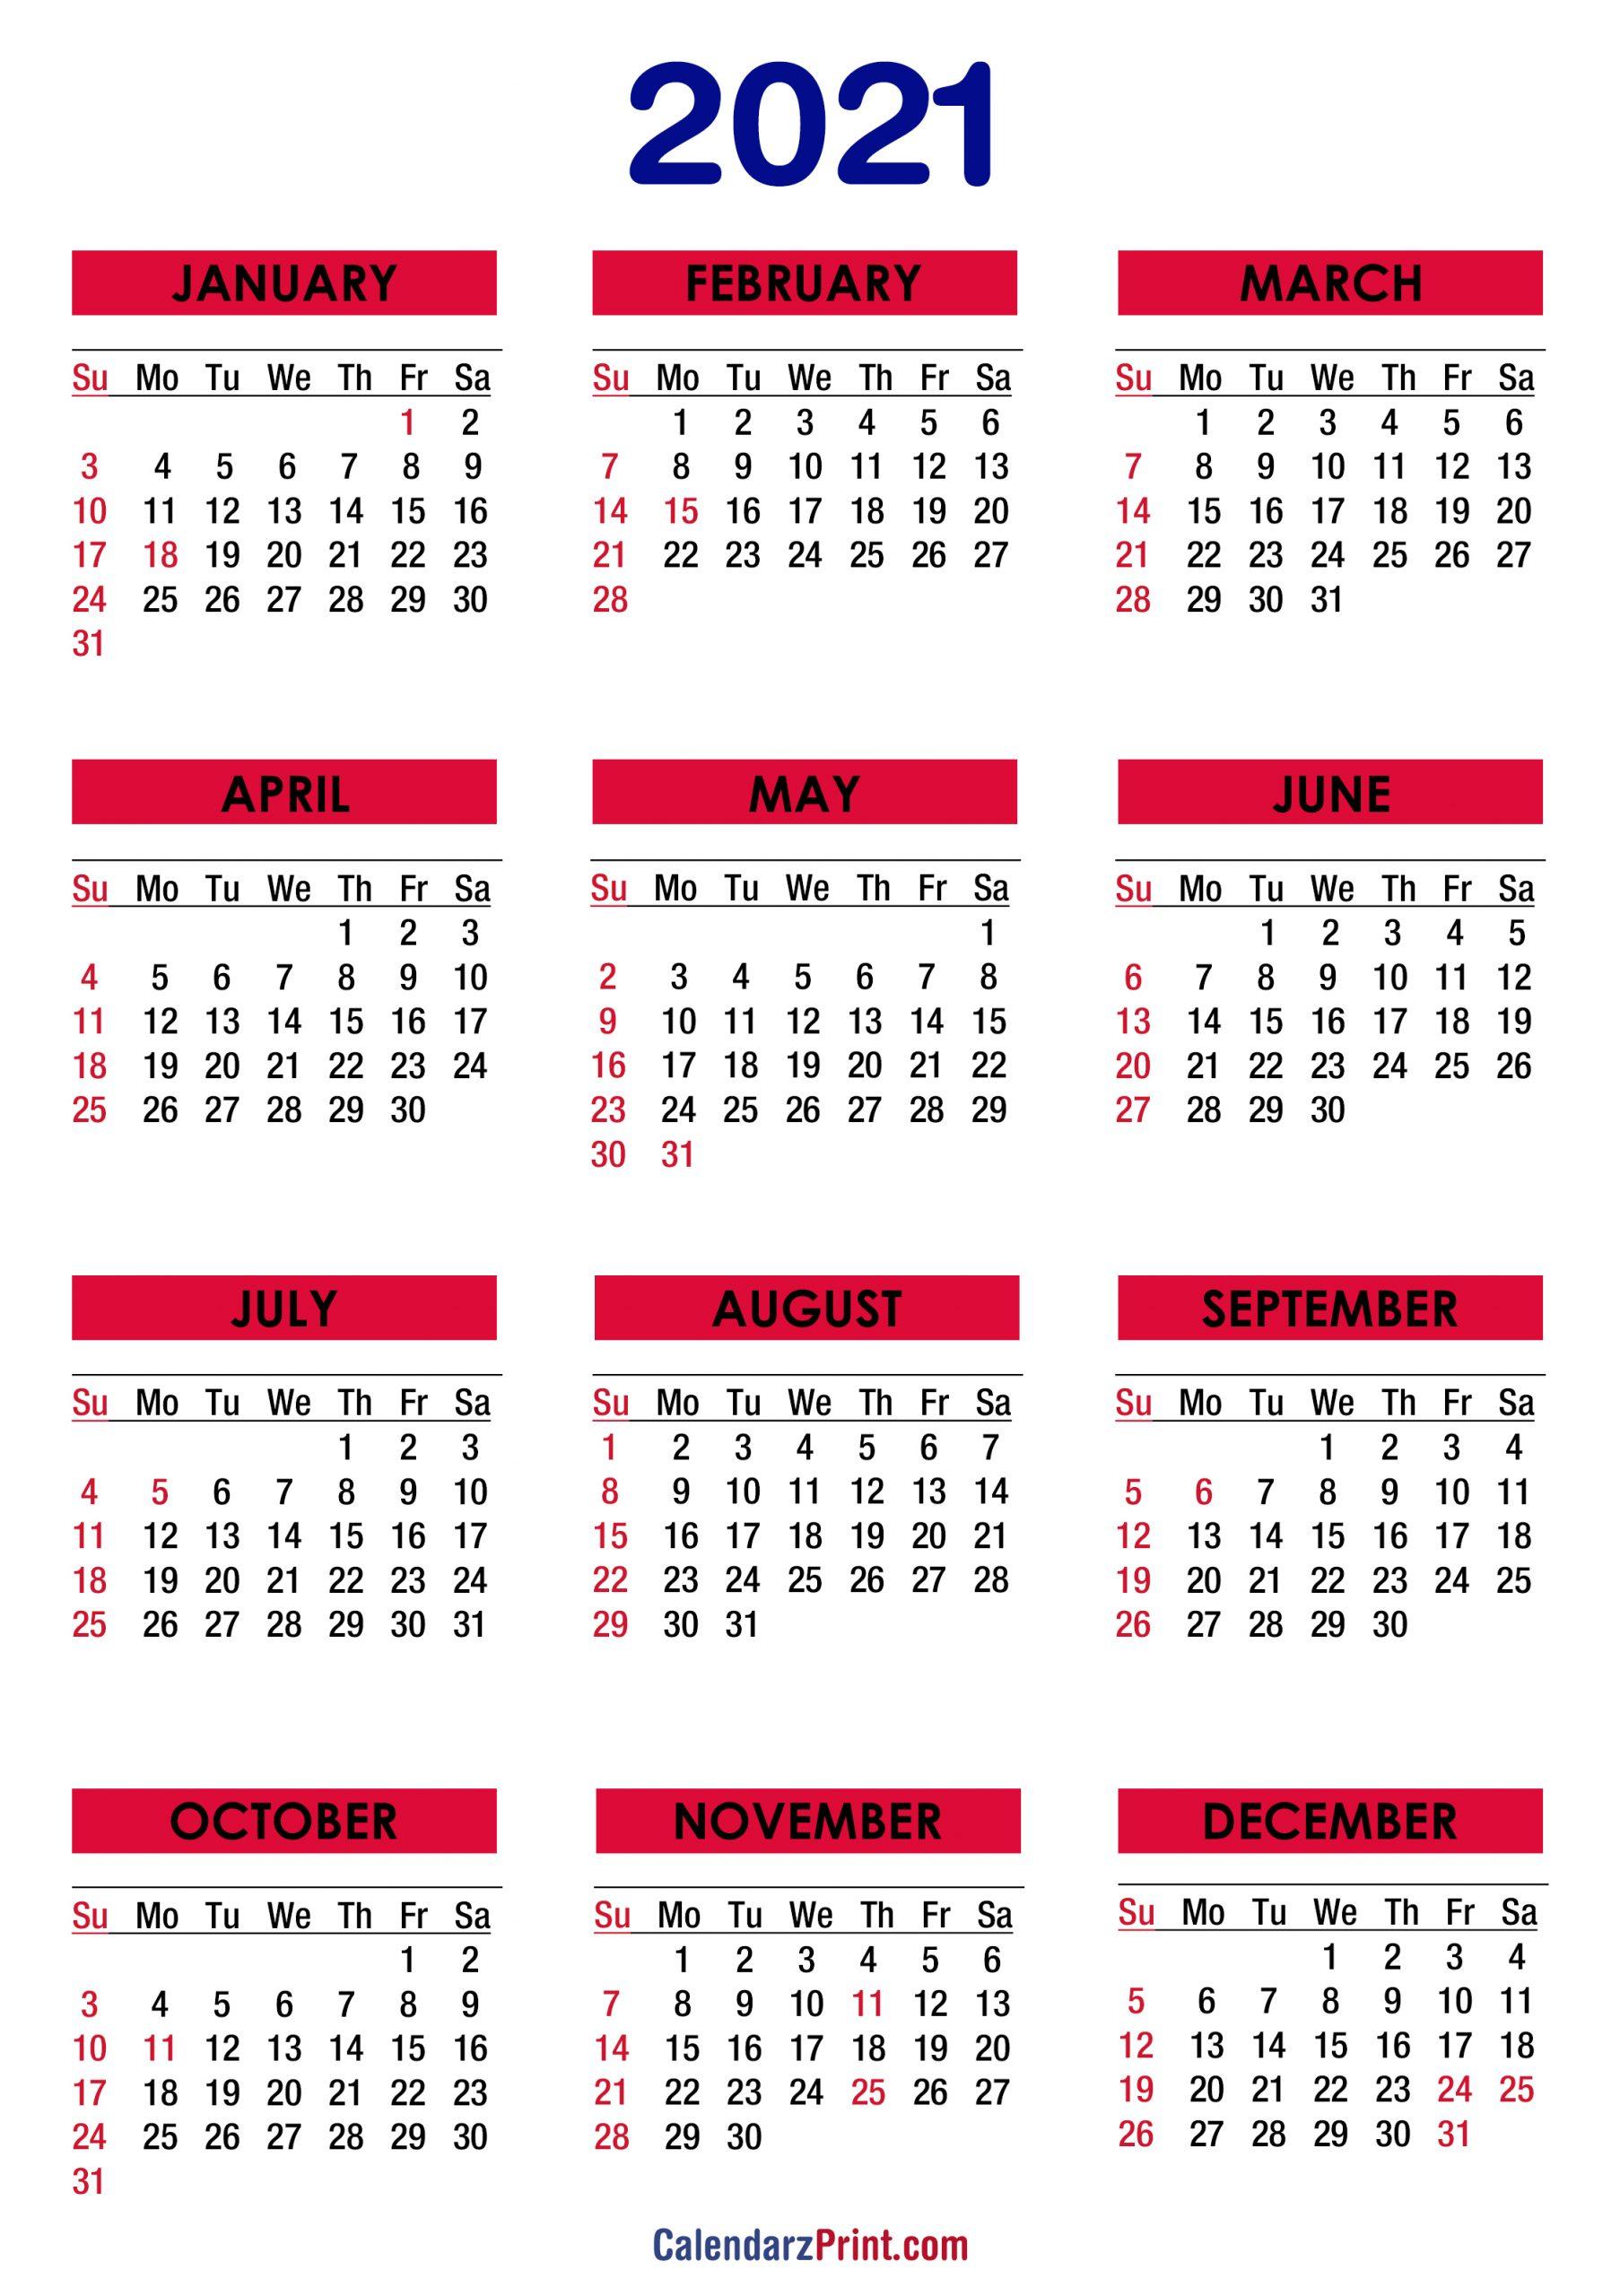 2021 Calendar With Holidays Printable Free Colorful